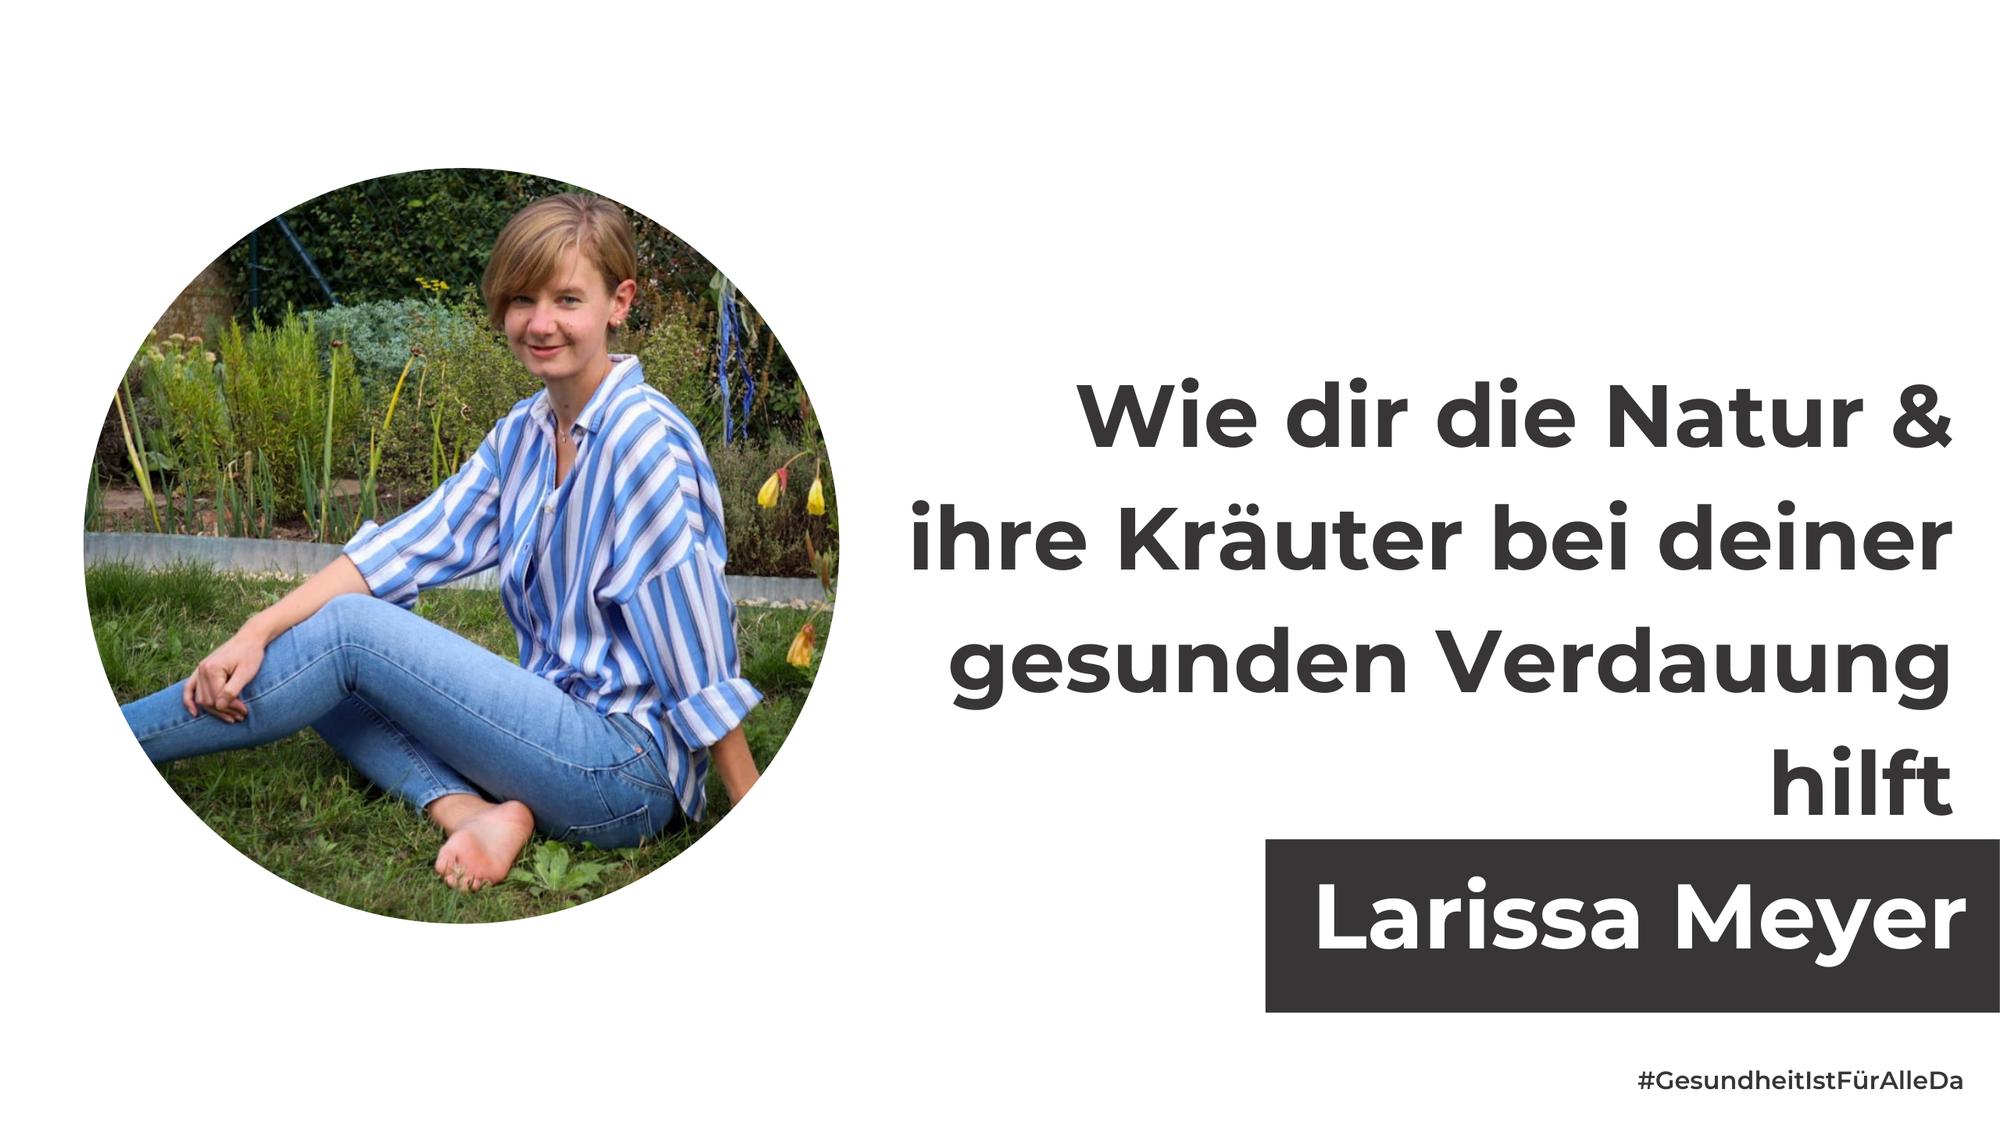 Larissa Meyer